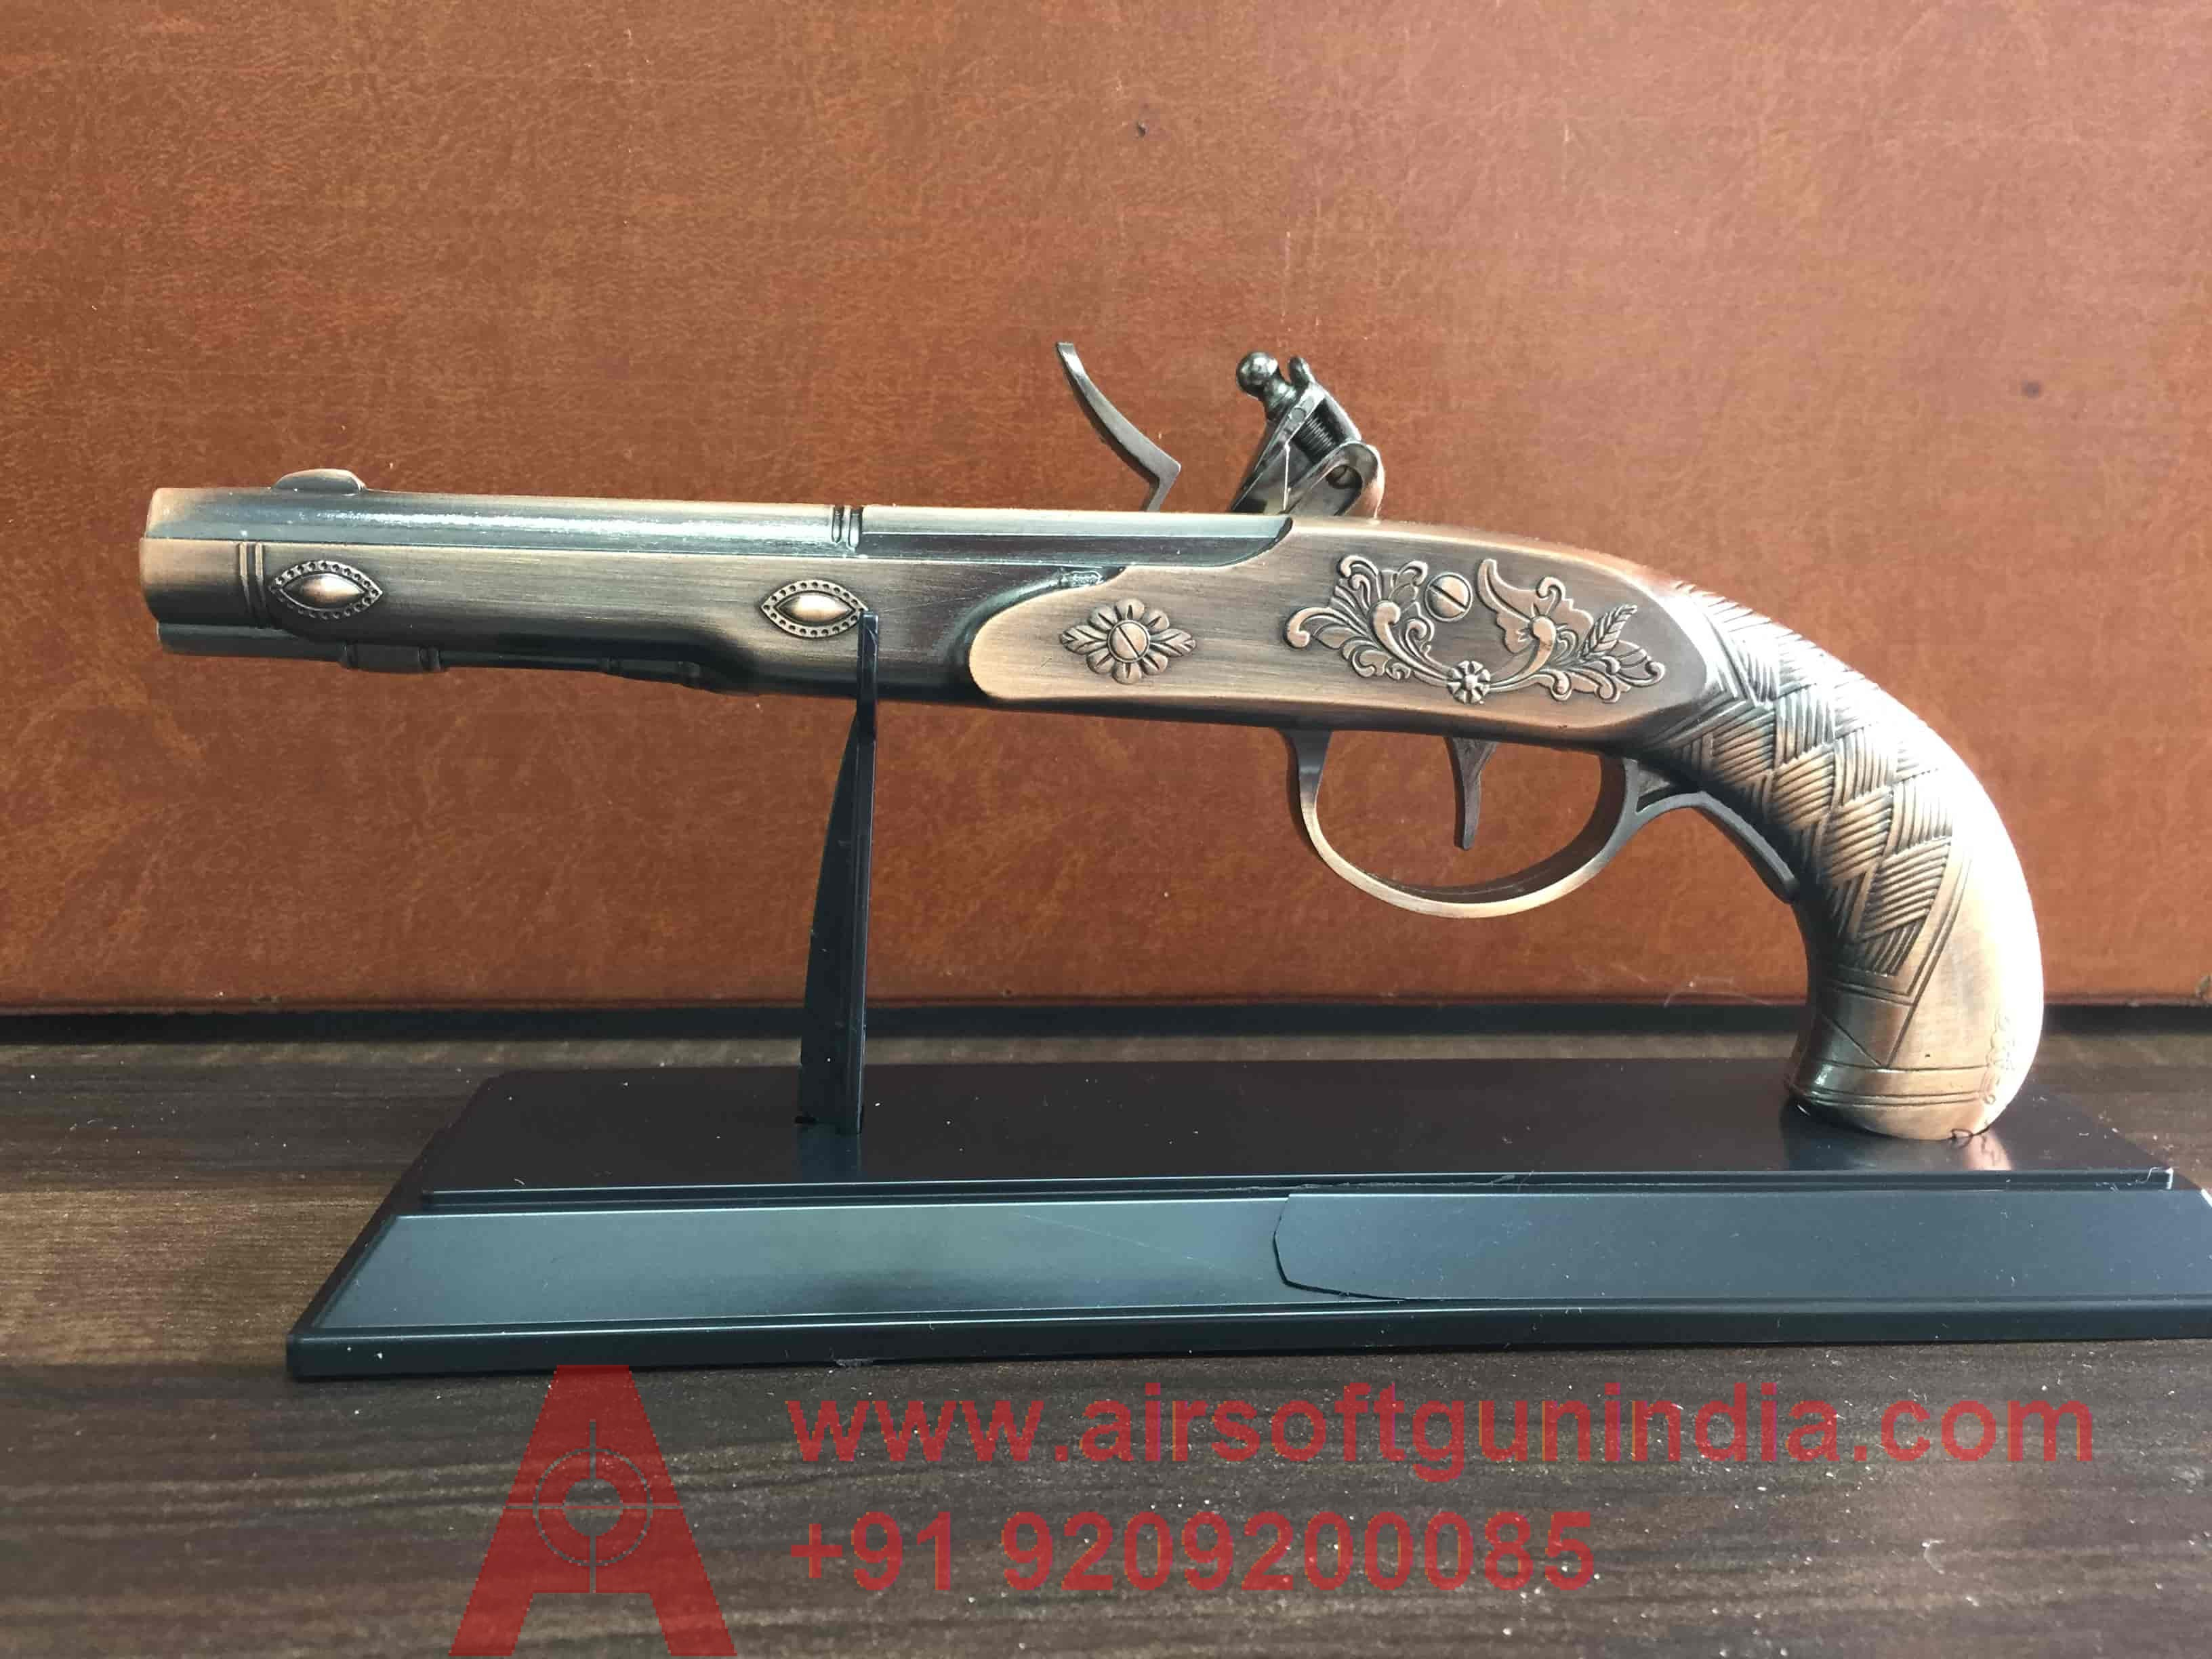 Flintlock Pistol Cigarette Lighter By Airsoft Gun India